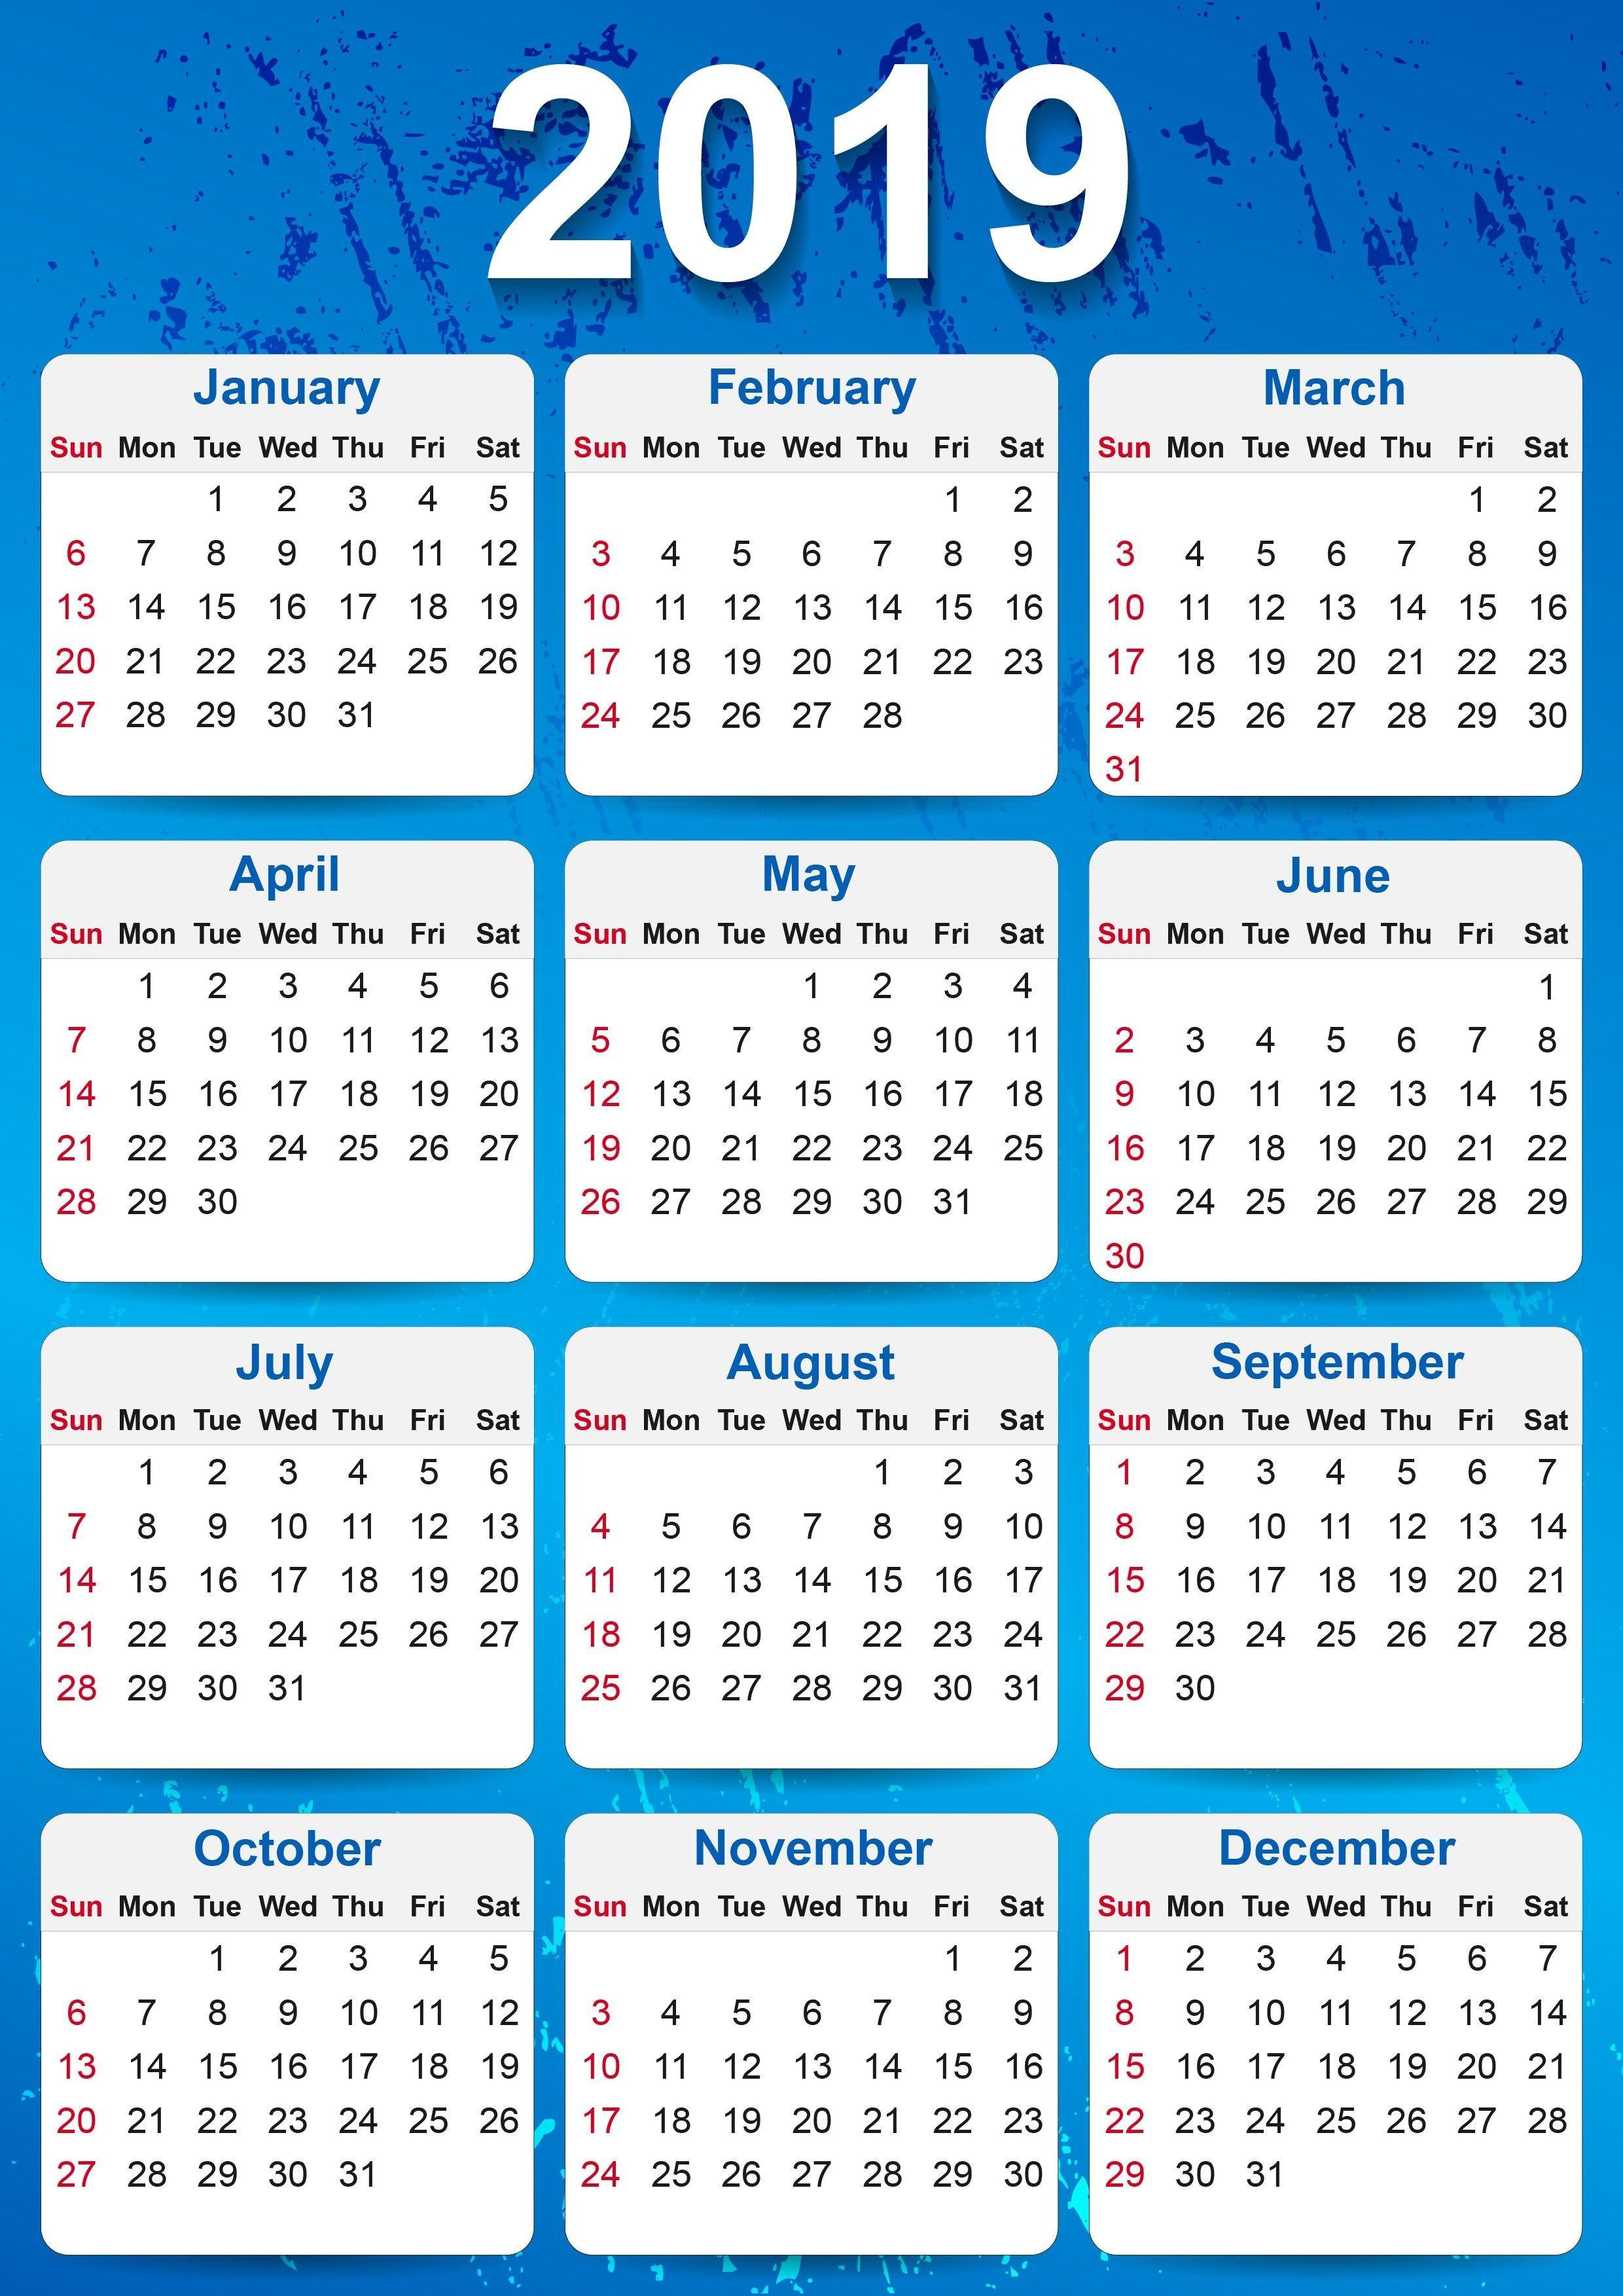 2019 Yearly Calendar Printable   Calendar   2019 Yearly Calendar Calendar 2019 Pdf Free Download